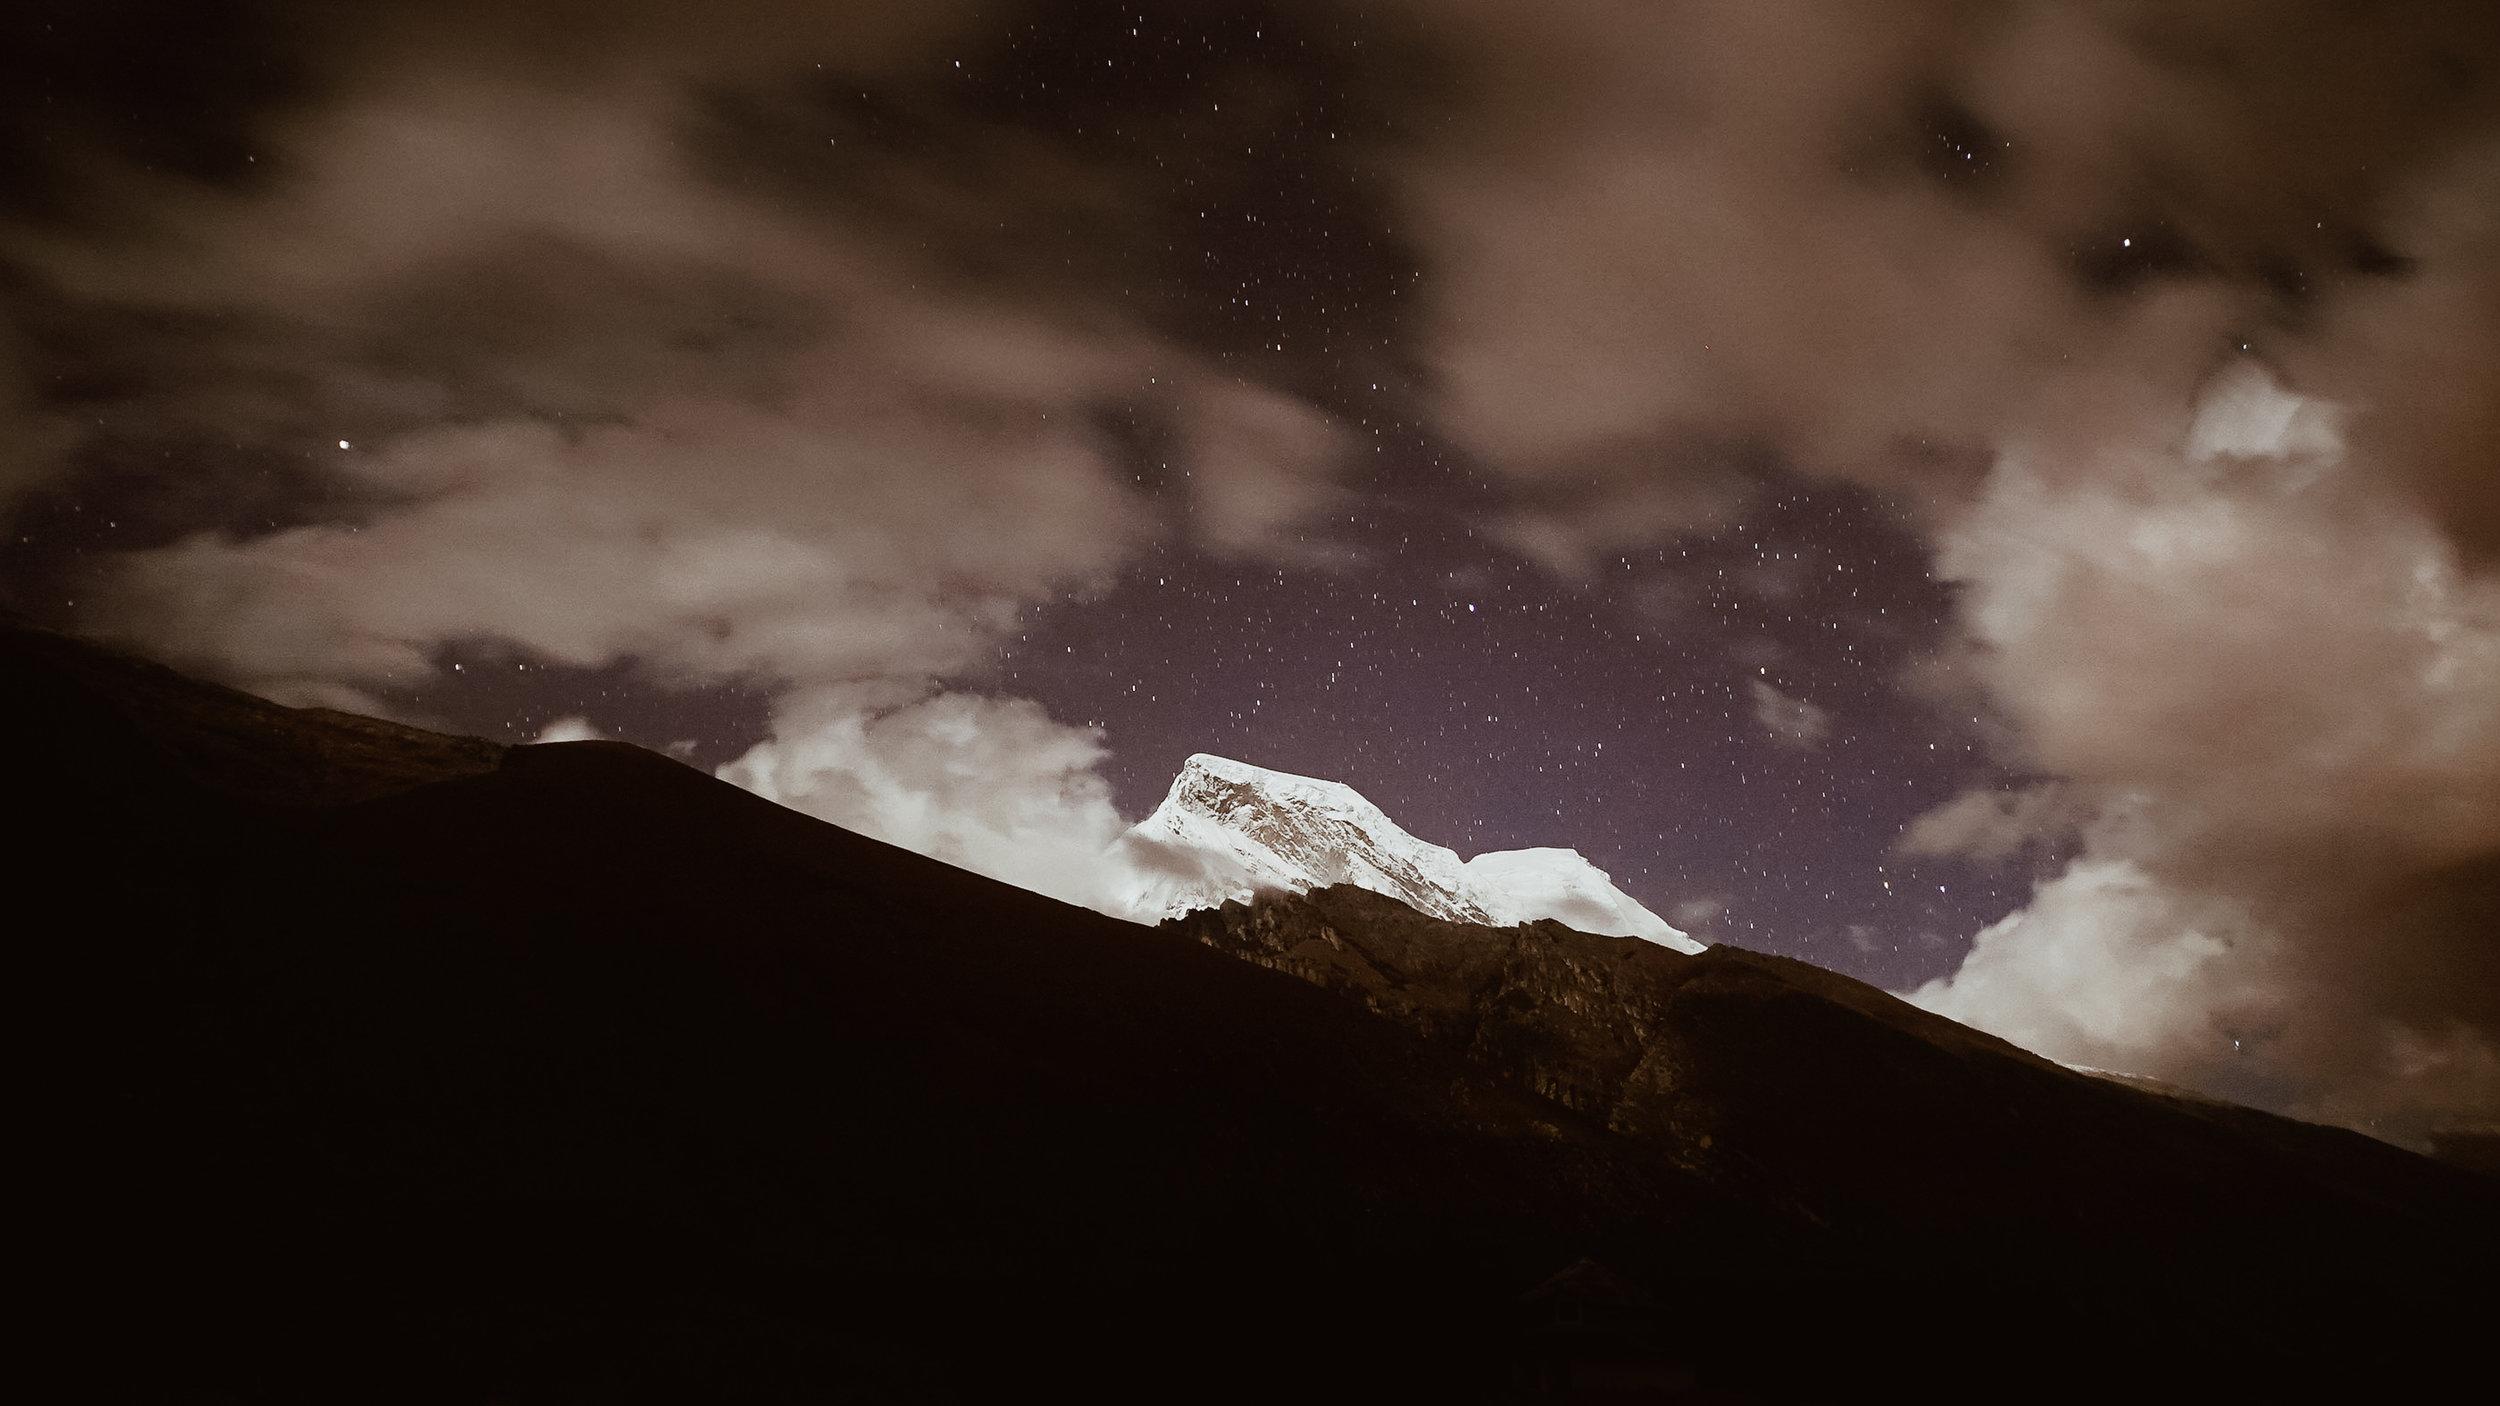 laguna+lake+69+hike+peru+travel+guide+life+on+pine_huascaran-stars-2.jpg